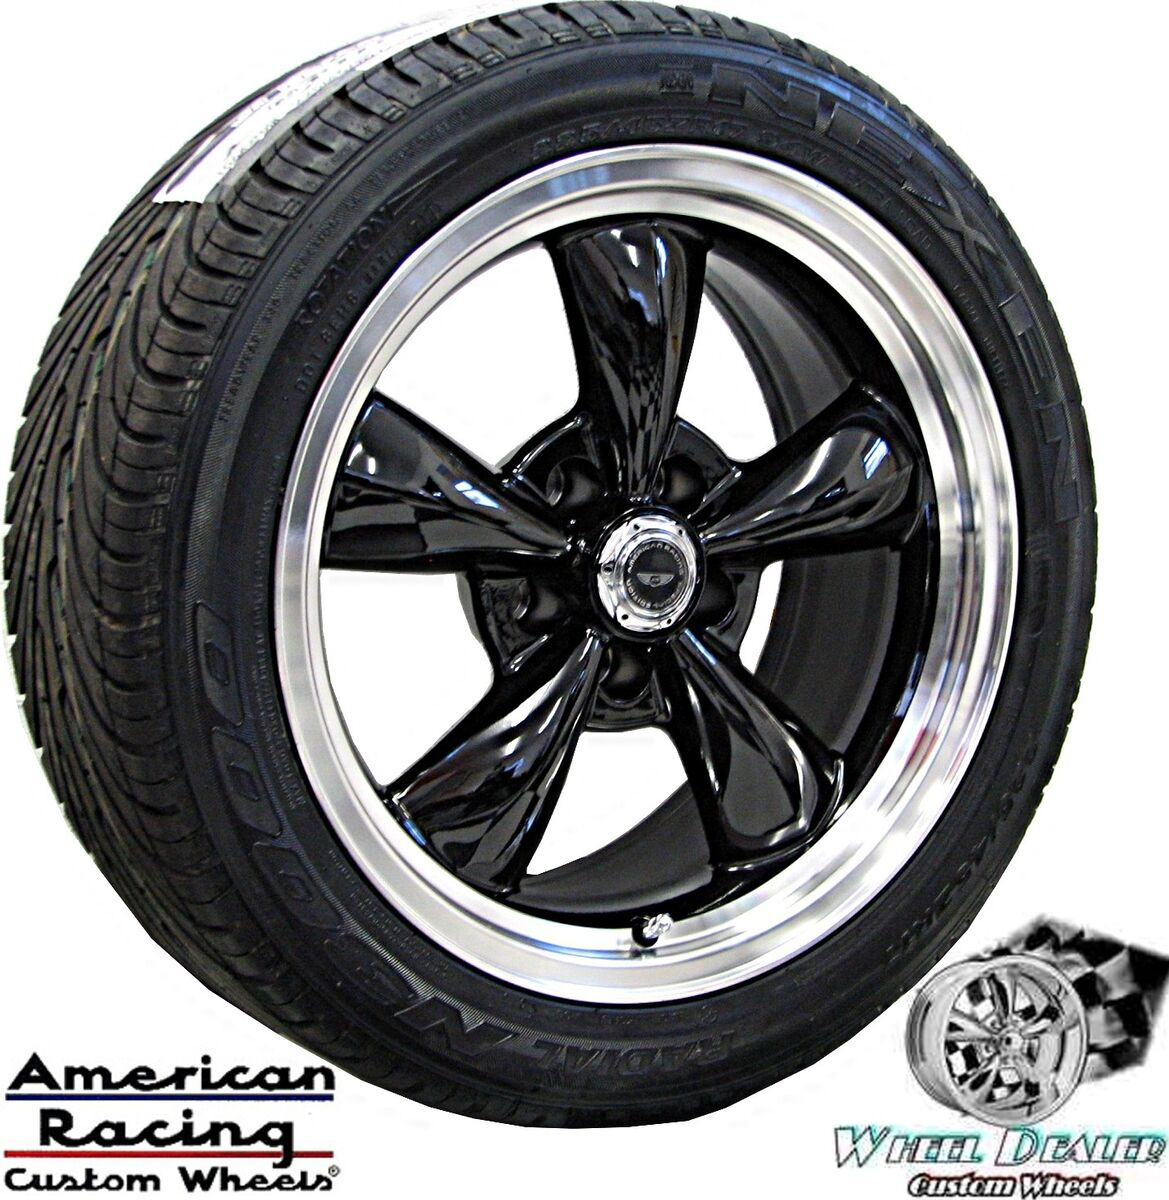 17 Black American Racing Wheels Tires Chevy Camaro Z28 SS V6 LT1 LS1